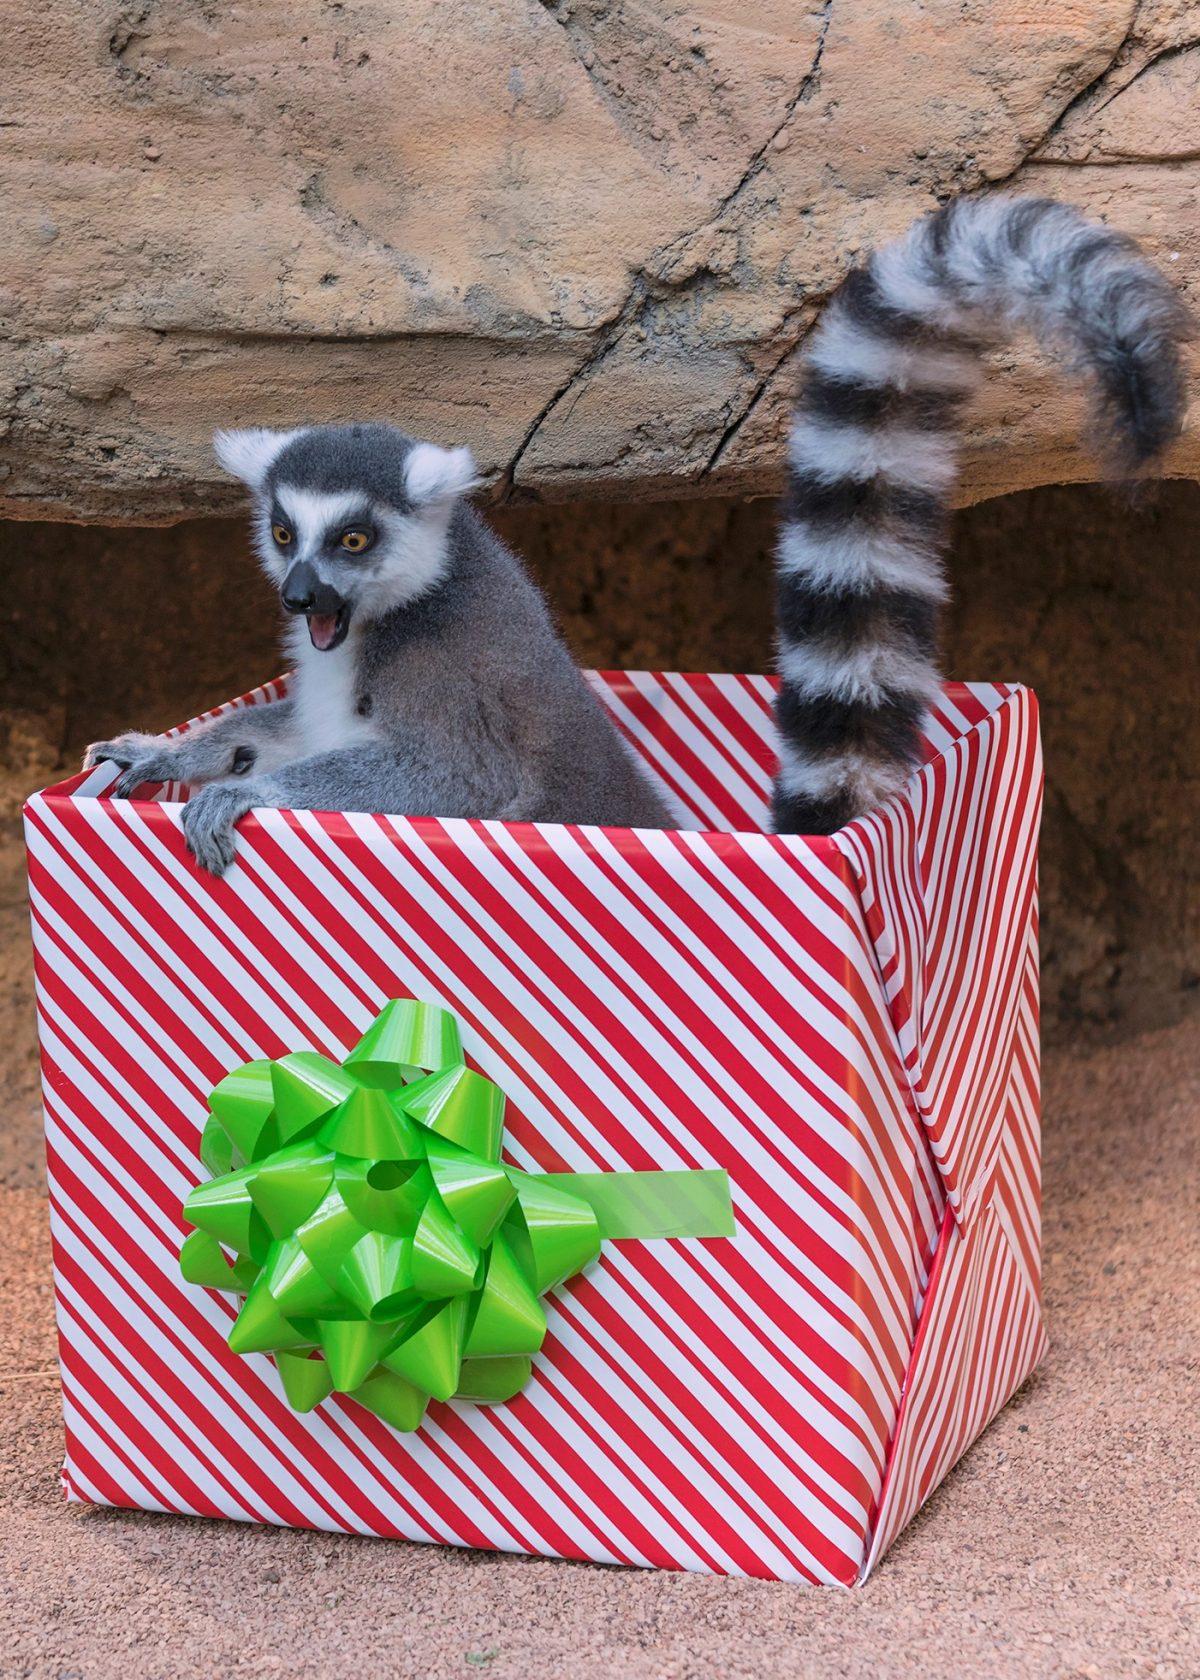 lemur sitting inside large, gift wrapped card board box